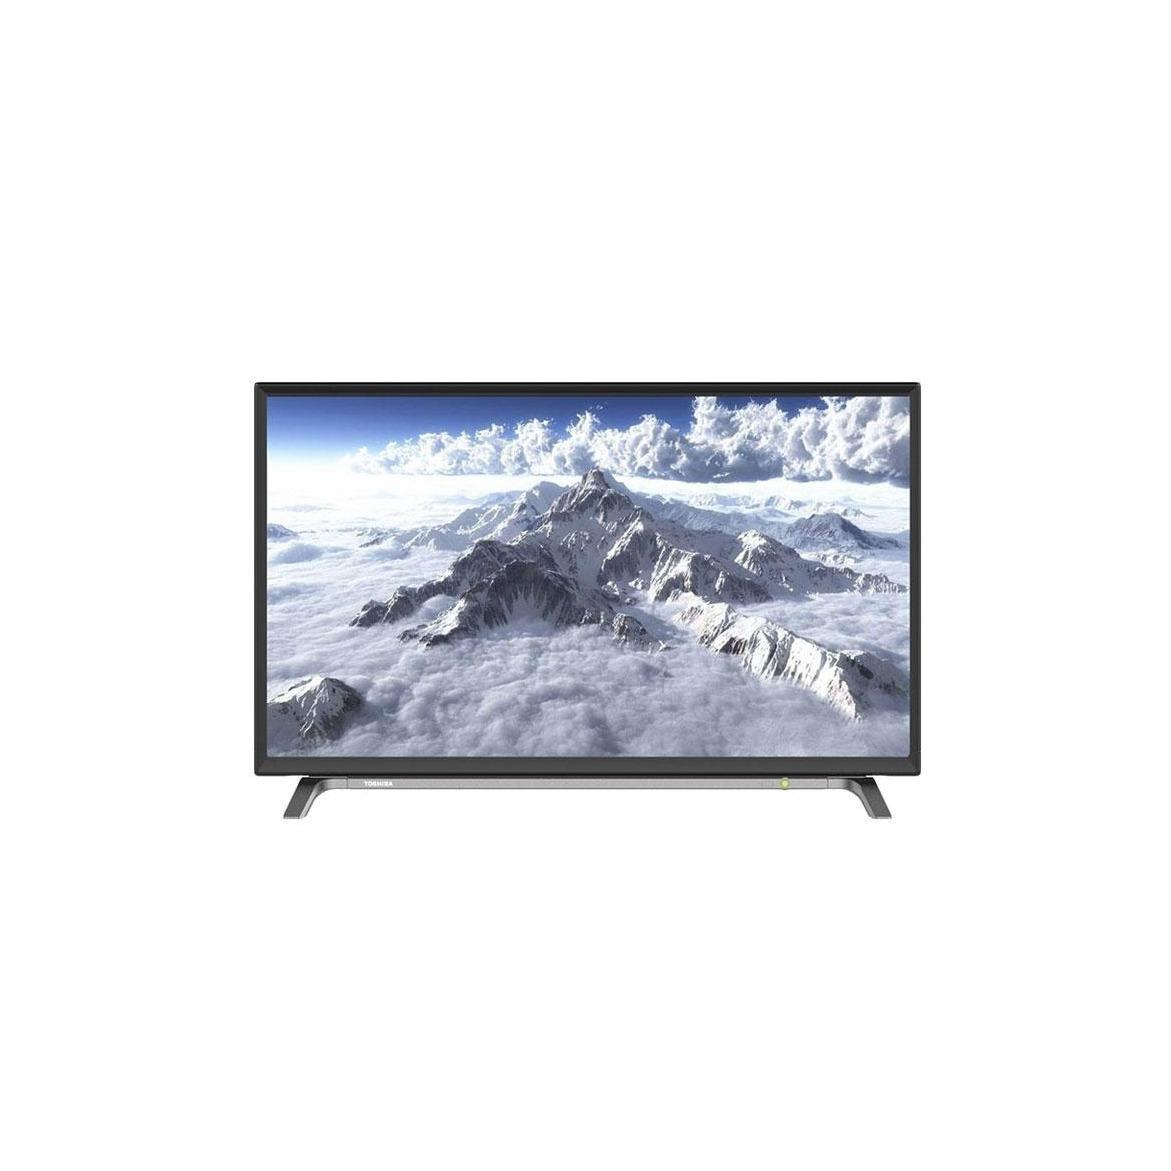 Toshiba 40L3650 LED TV [40 Inch]